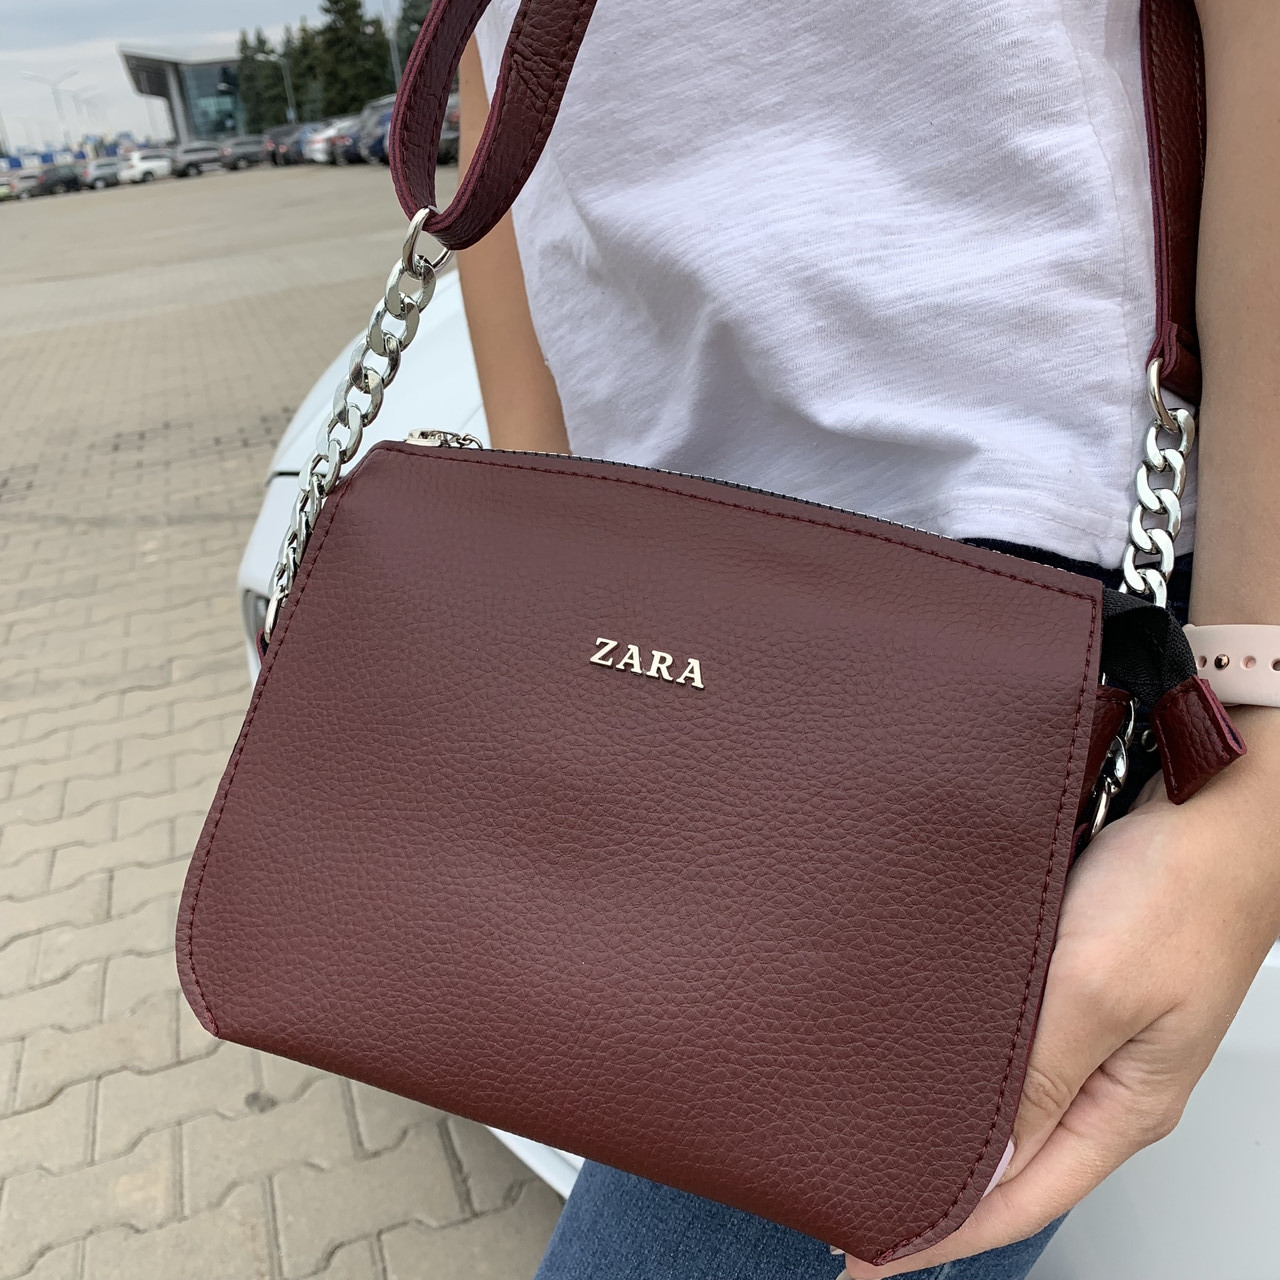 Женская сумка бордо Zara  (1536)